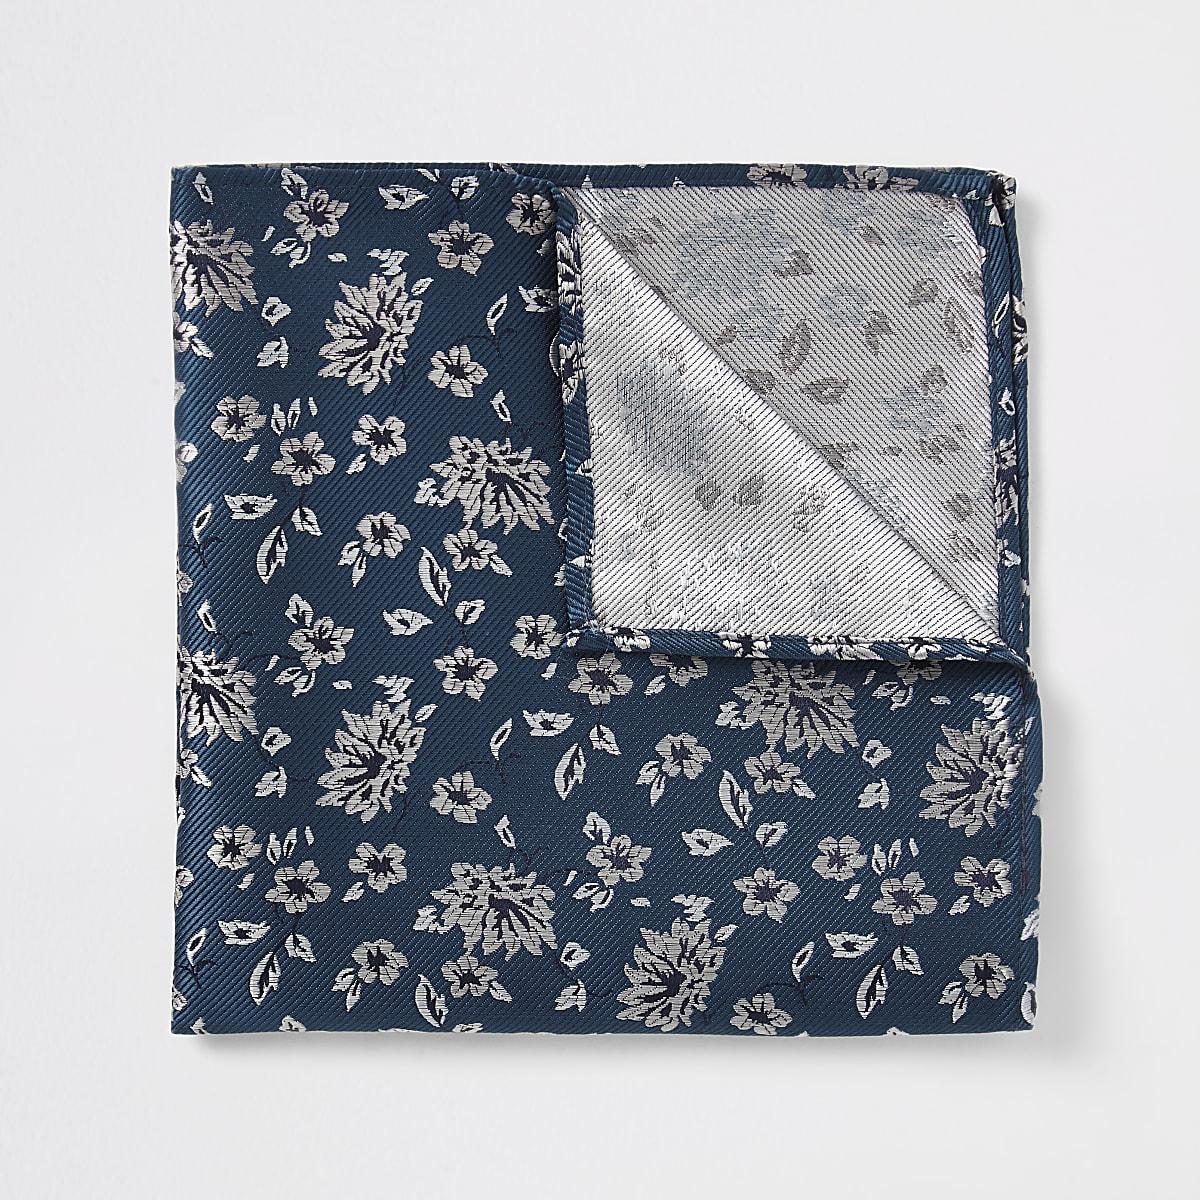 Teal floral handkerchief